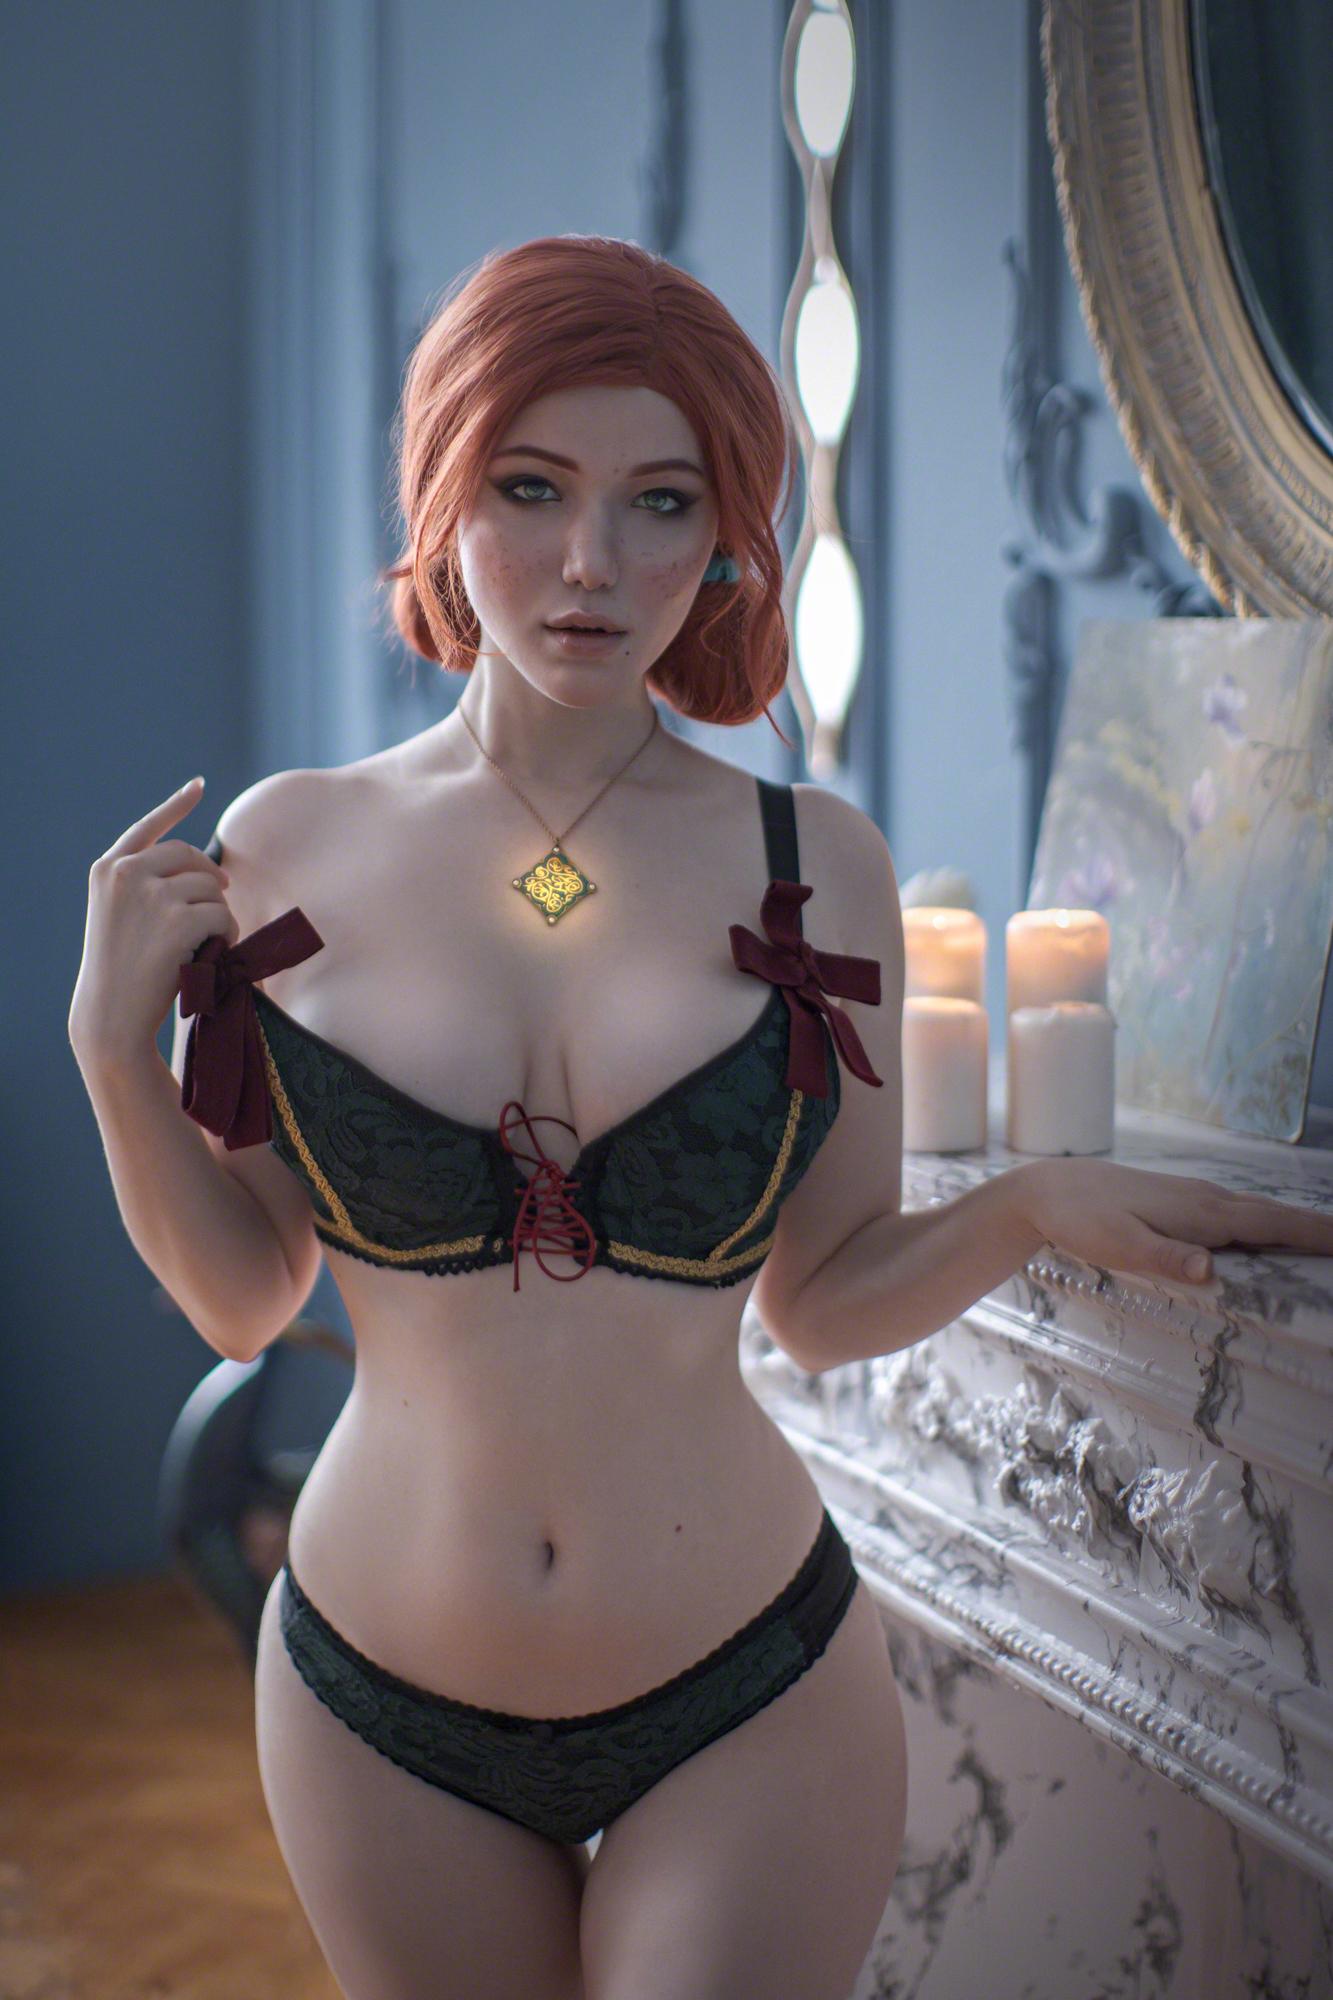 Leaked Nude Set From Lada Lyumos Patreon 0002